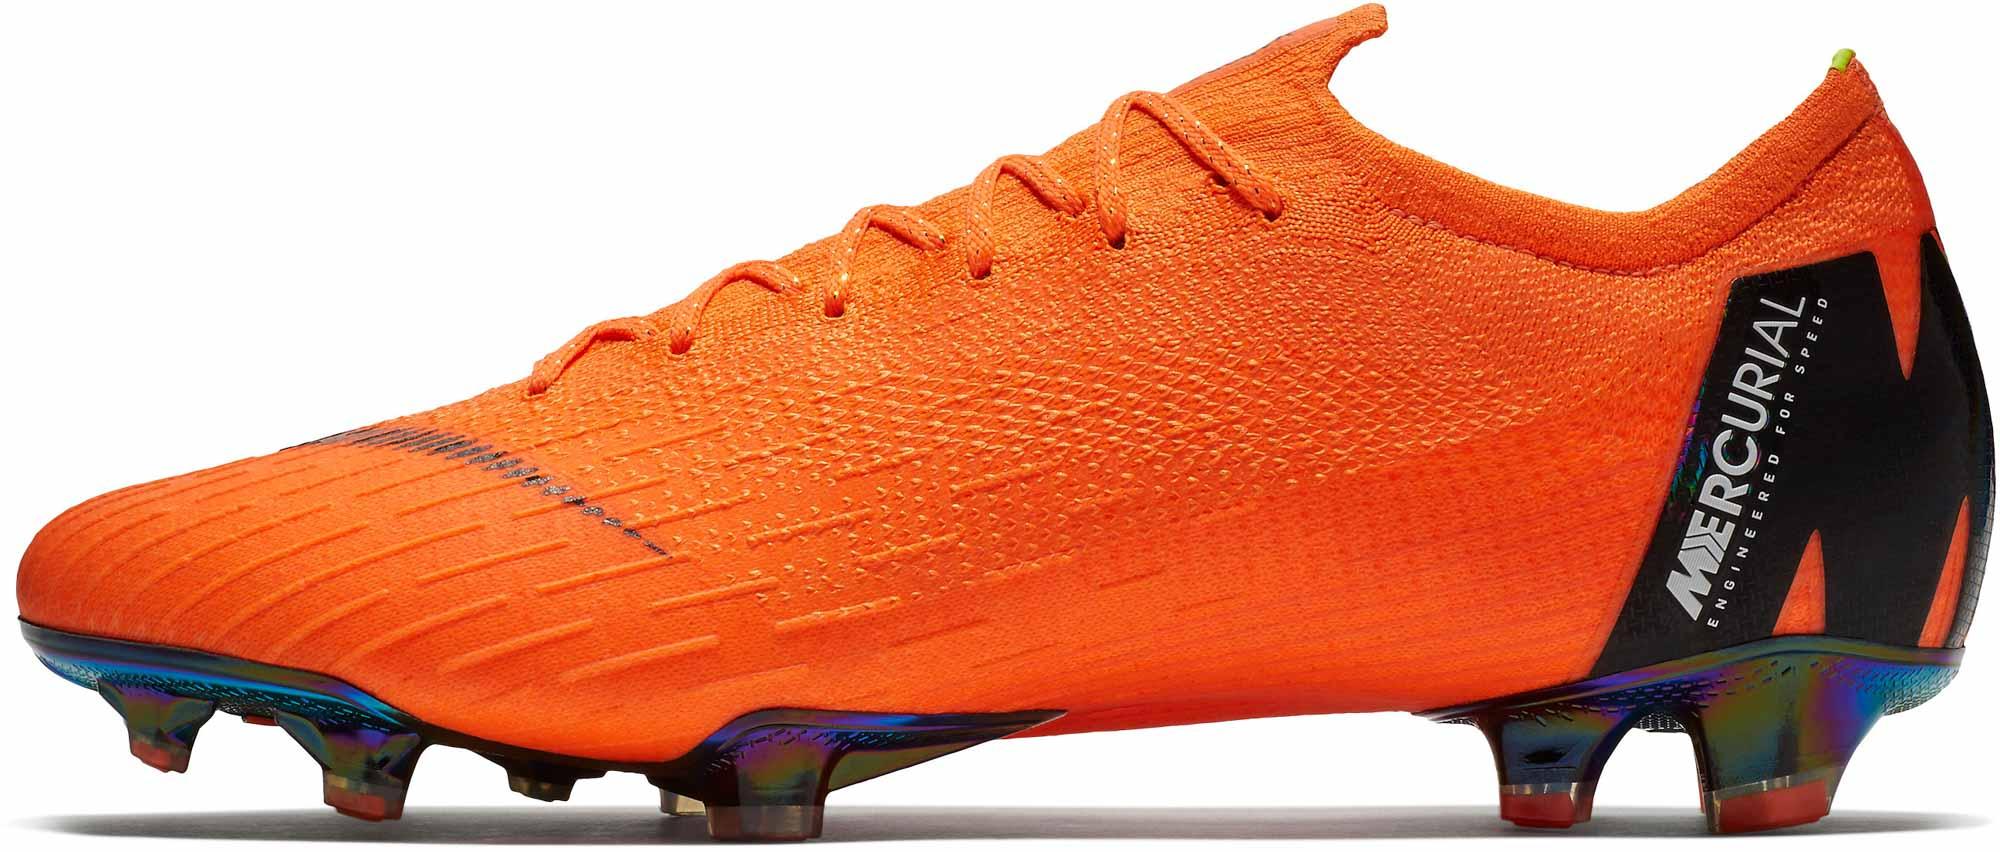 d3ff286a72c Home   Shop By Brand   Nike Soccer   Nike Soccer Shoes   Nike Mercurial  Vapor ...